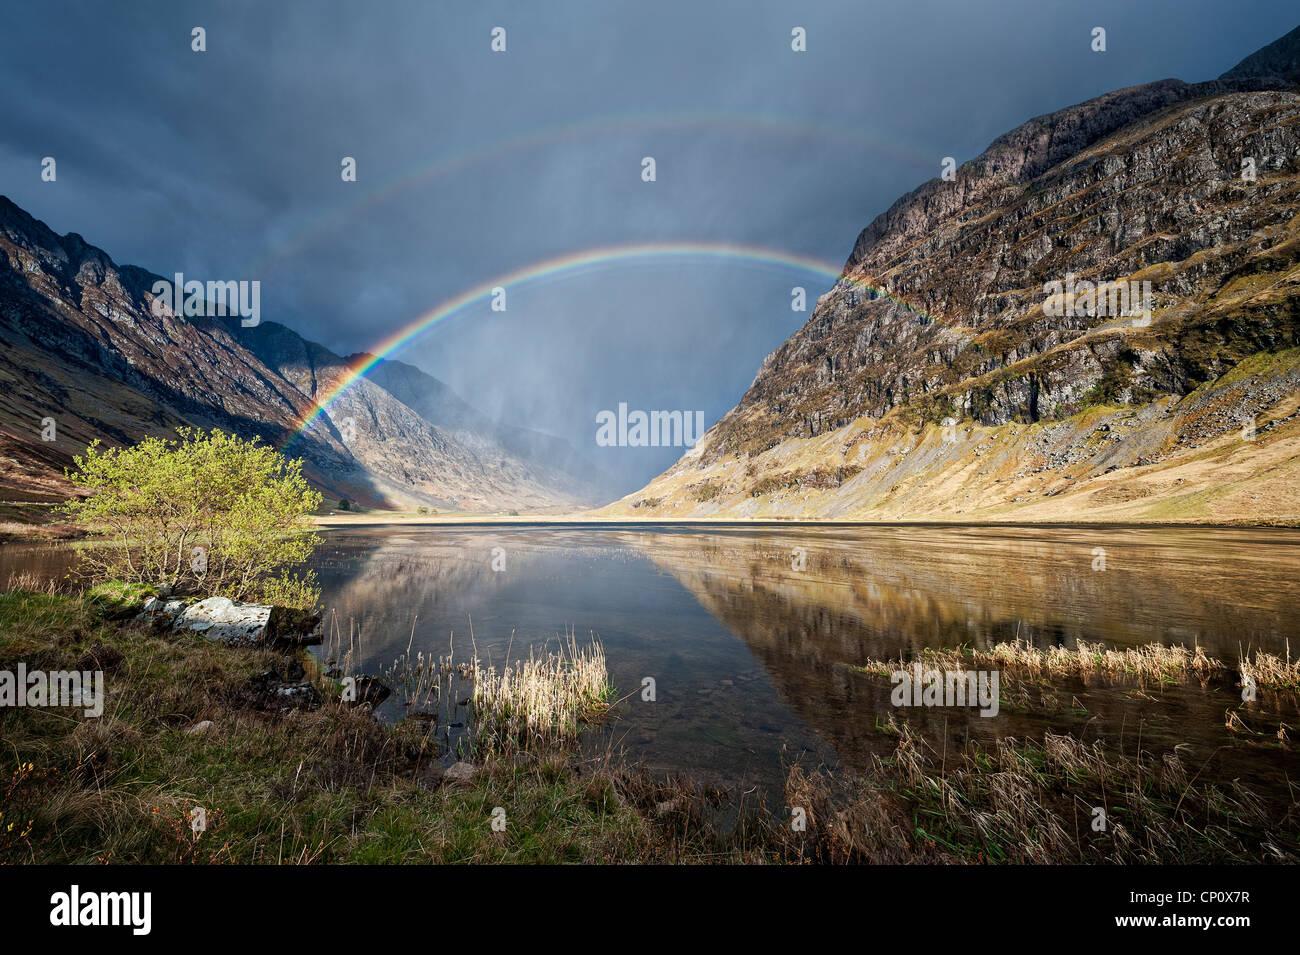 Loch Achtriochtan, Glen Coe - Stock Image